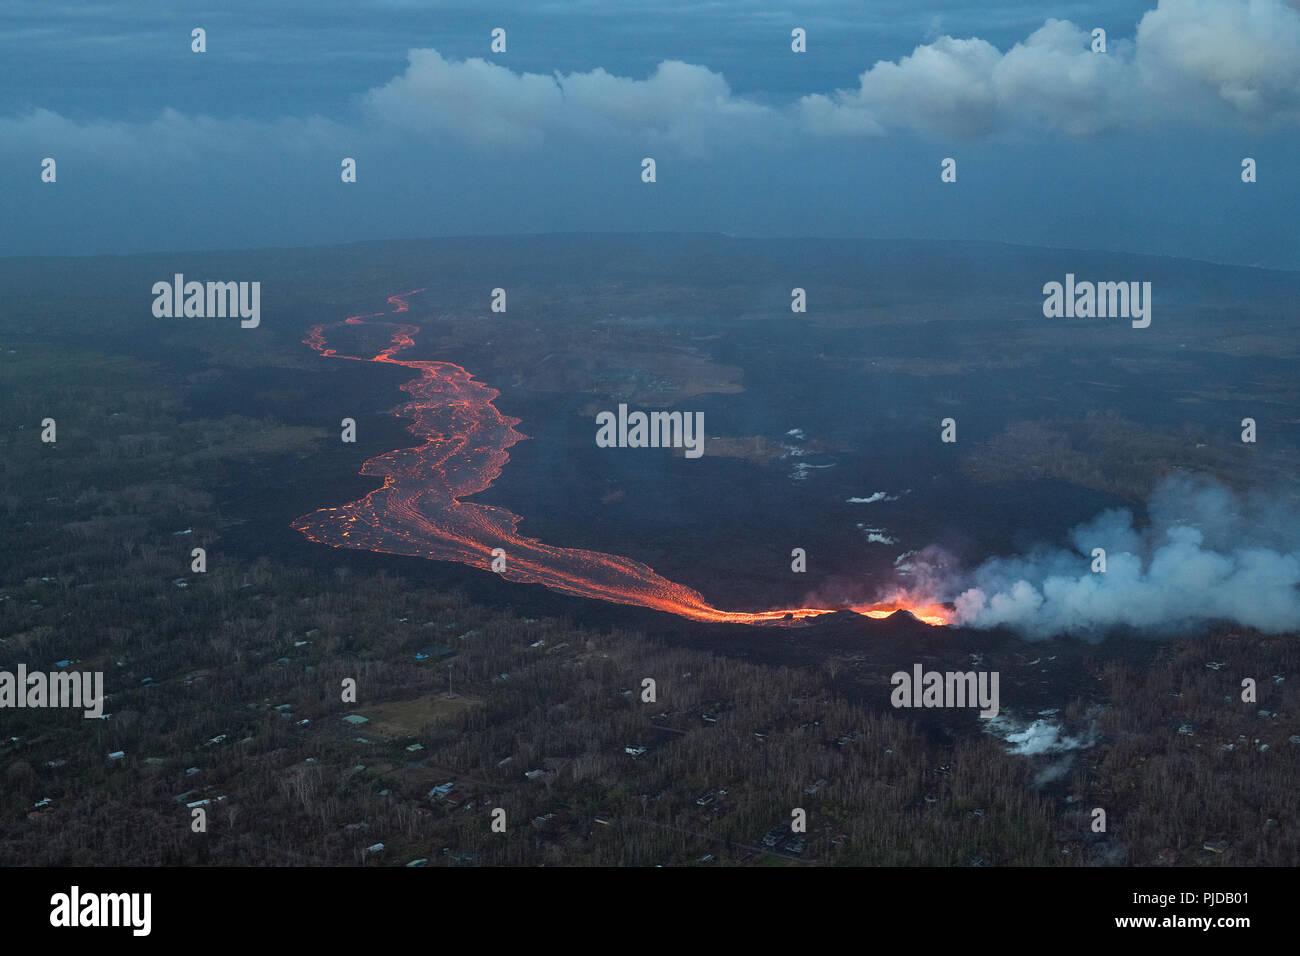 river of hot lava flows from fissure 8 in Kilauea Volcano east rift zone in Leilani Estates subdivision, near Pahoa, toward the sea at Kapoho, Hawaii - Stock Image